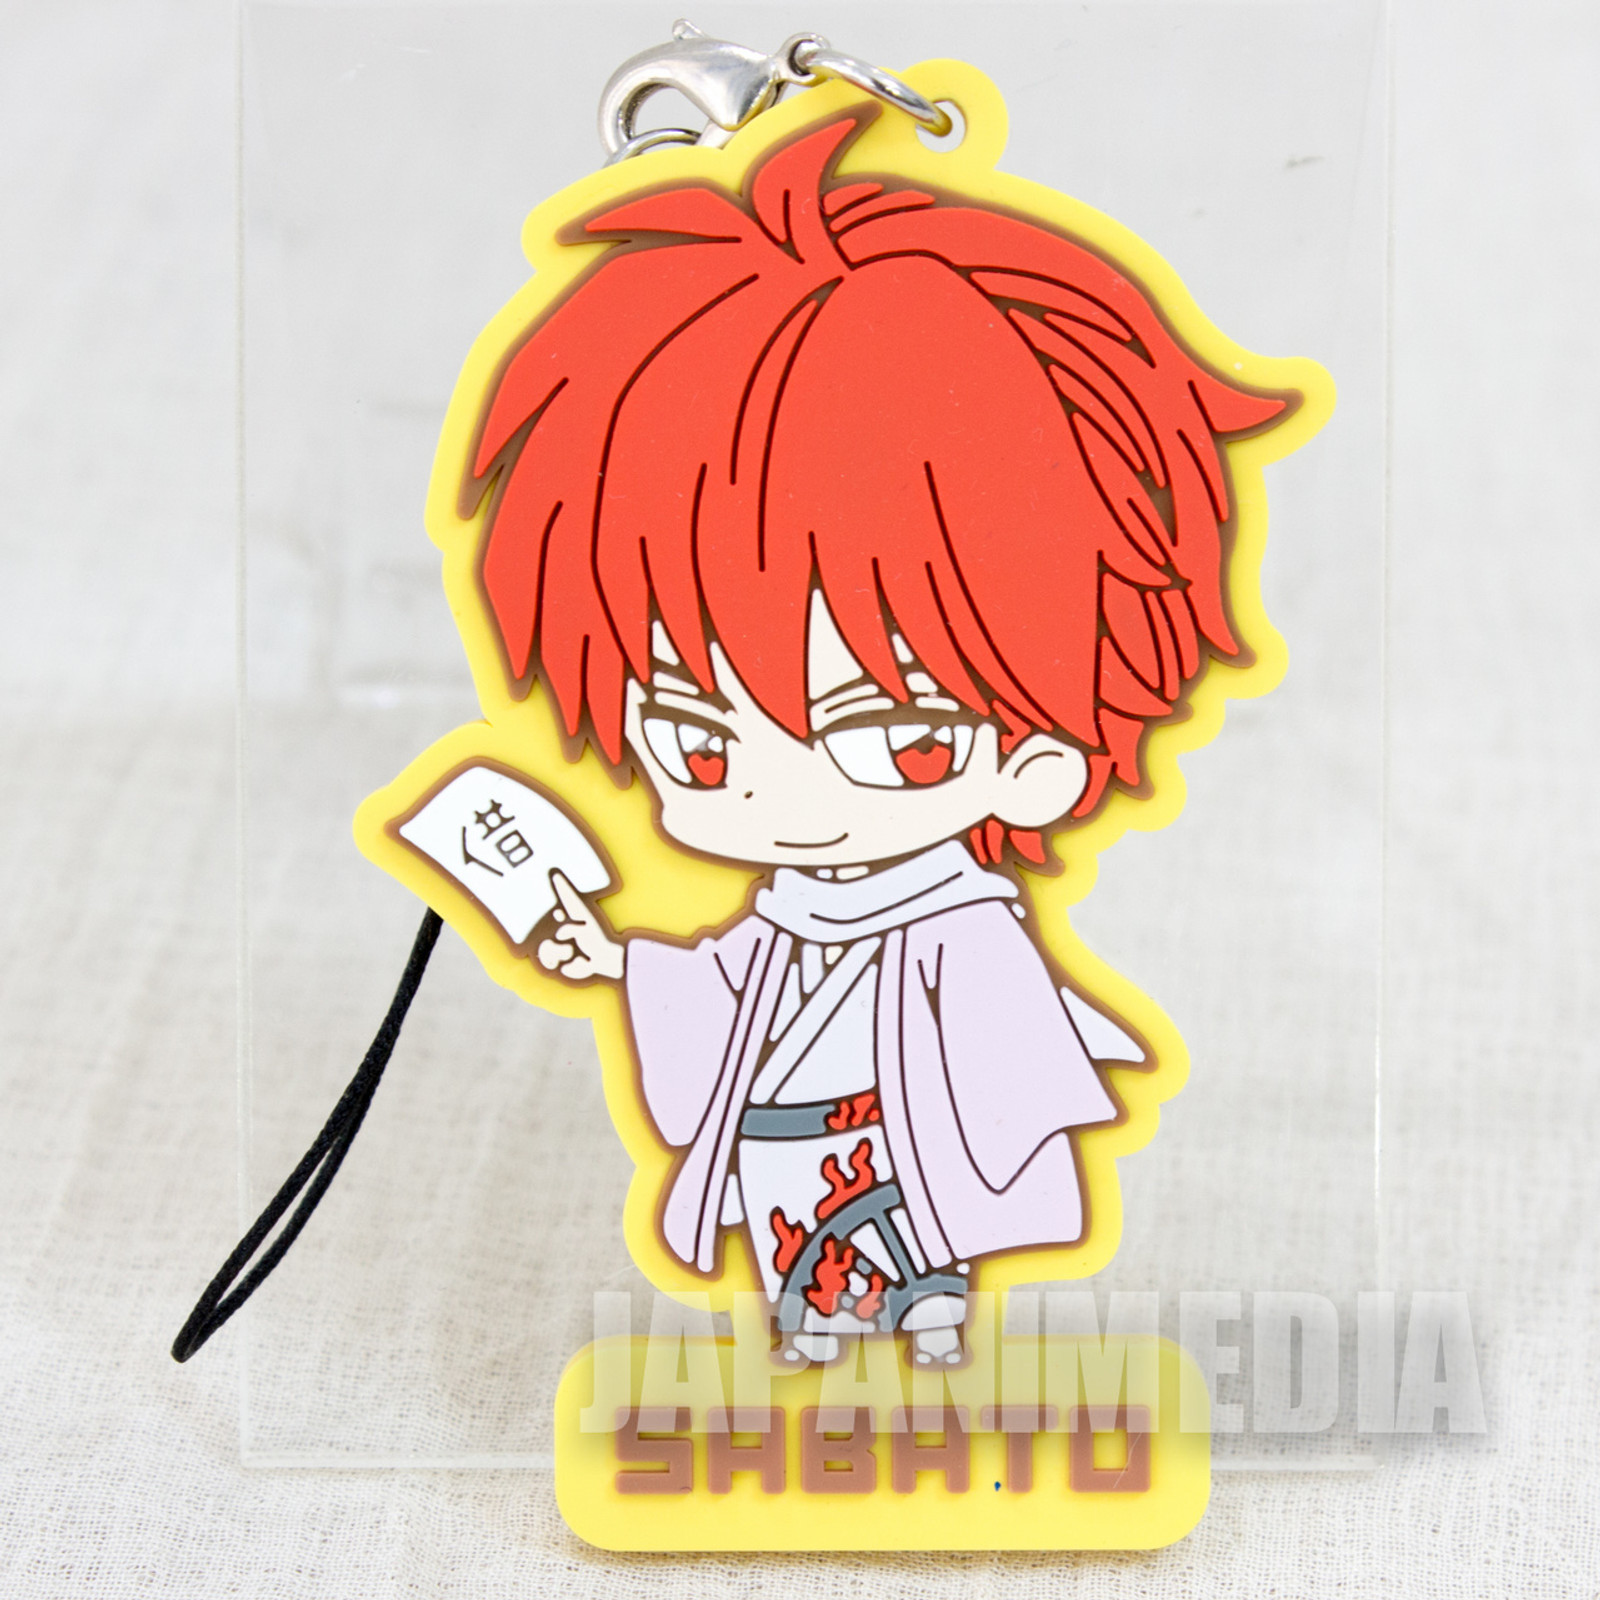 Kyokai no Rinne Sabato Rokudo Mascot Rubber Strap JAPAN ANIME MANGA